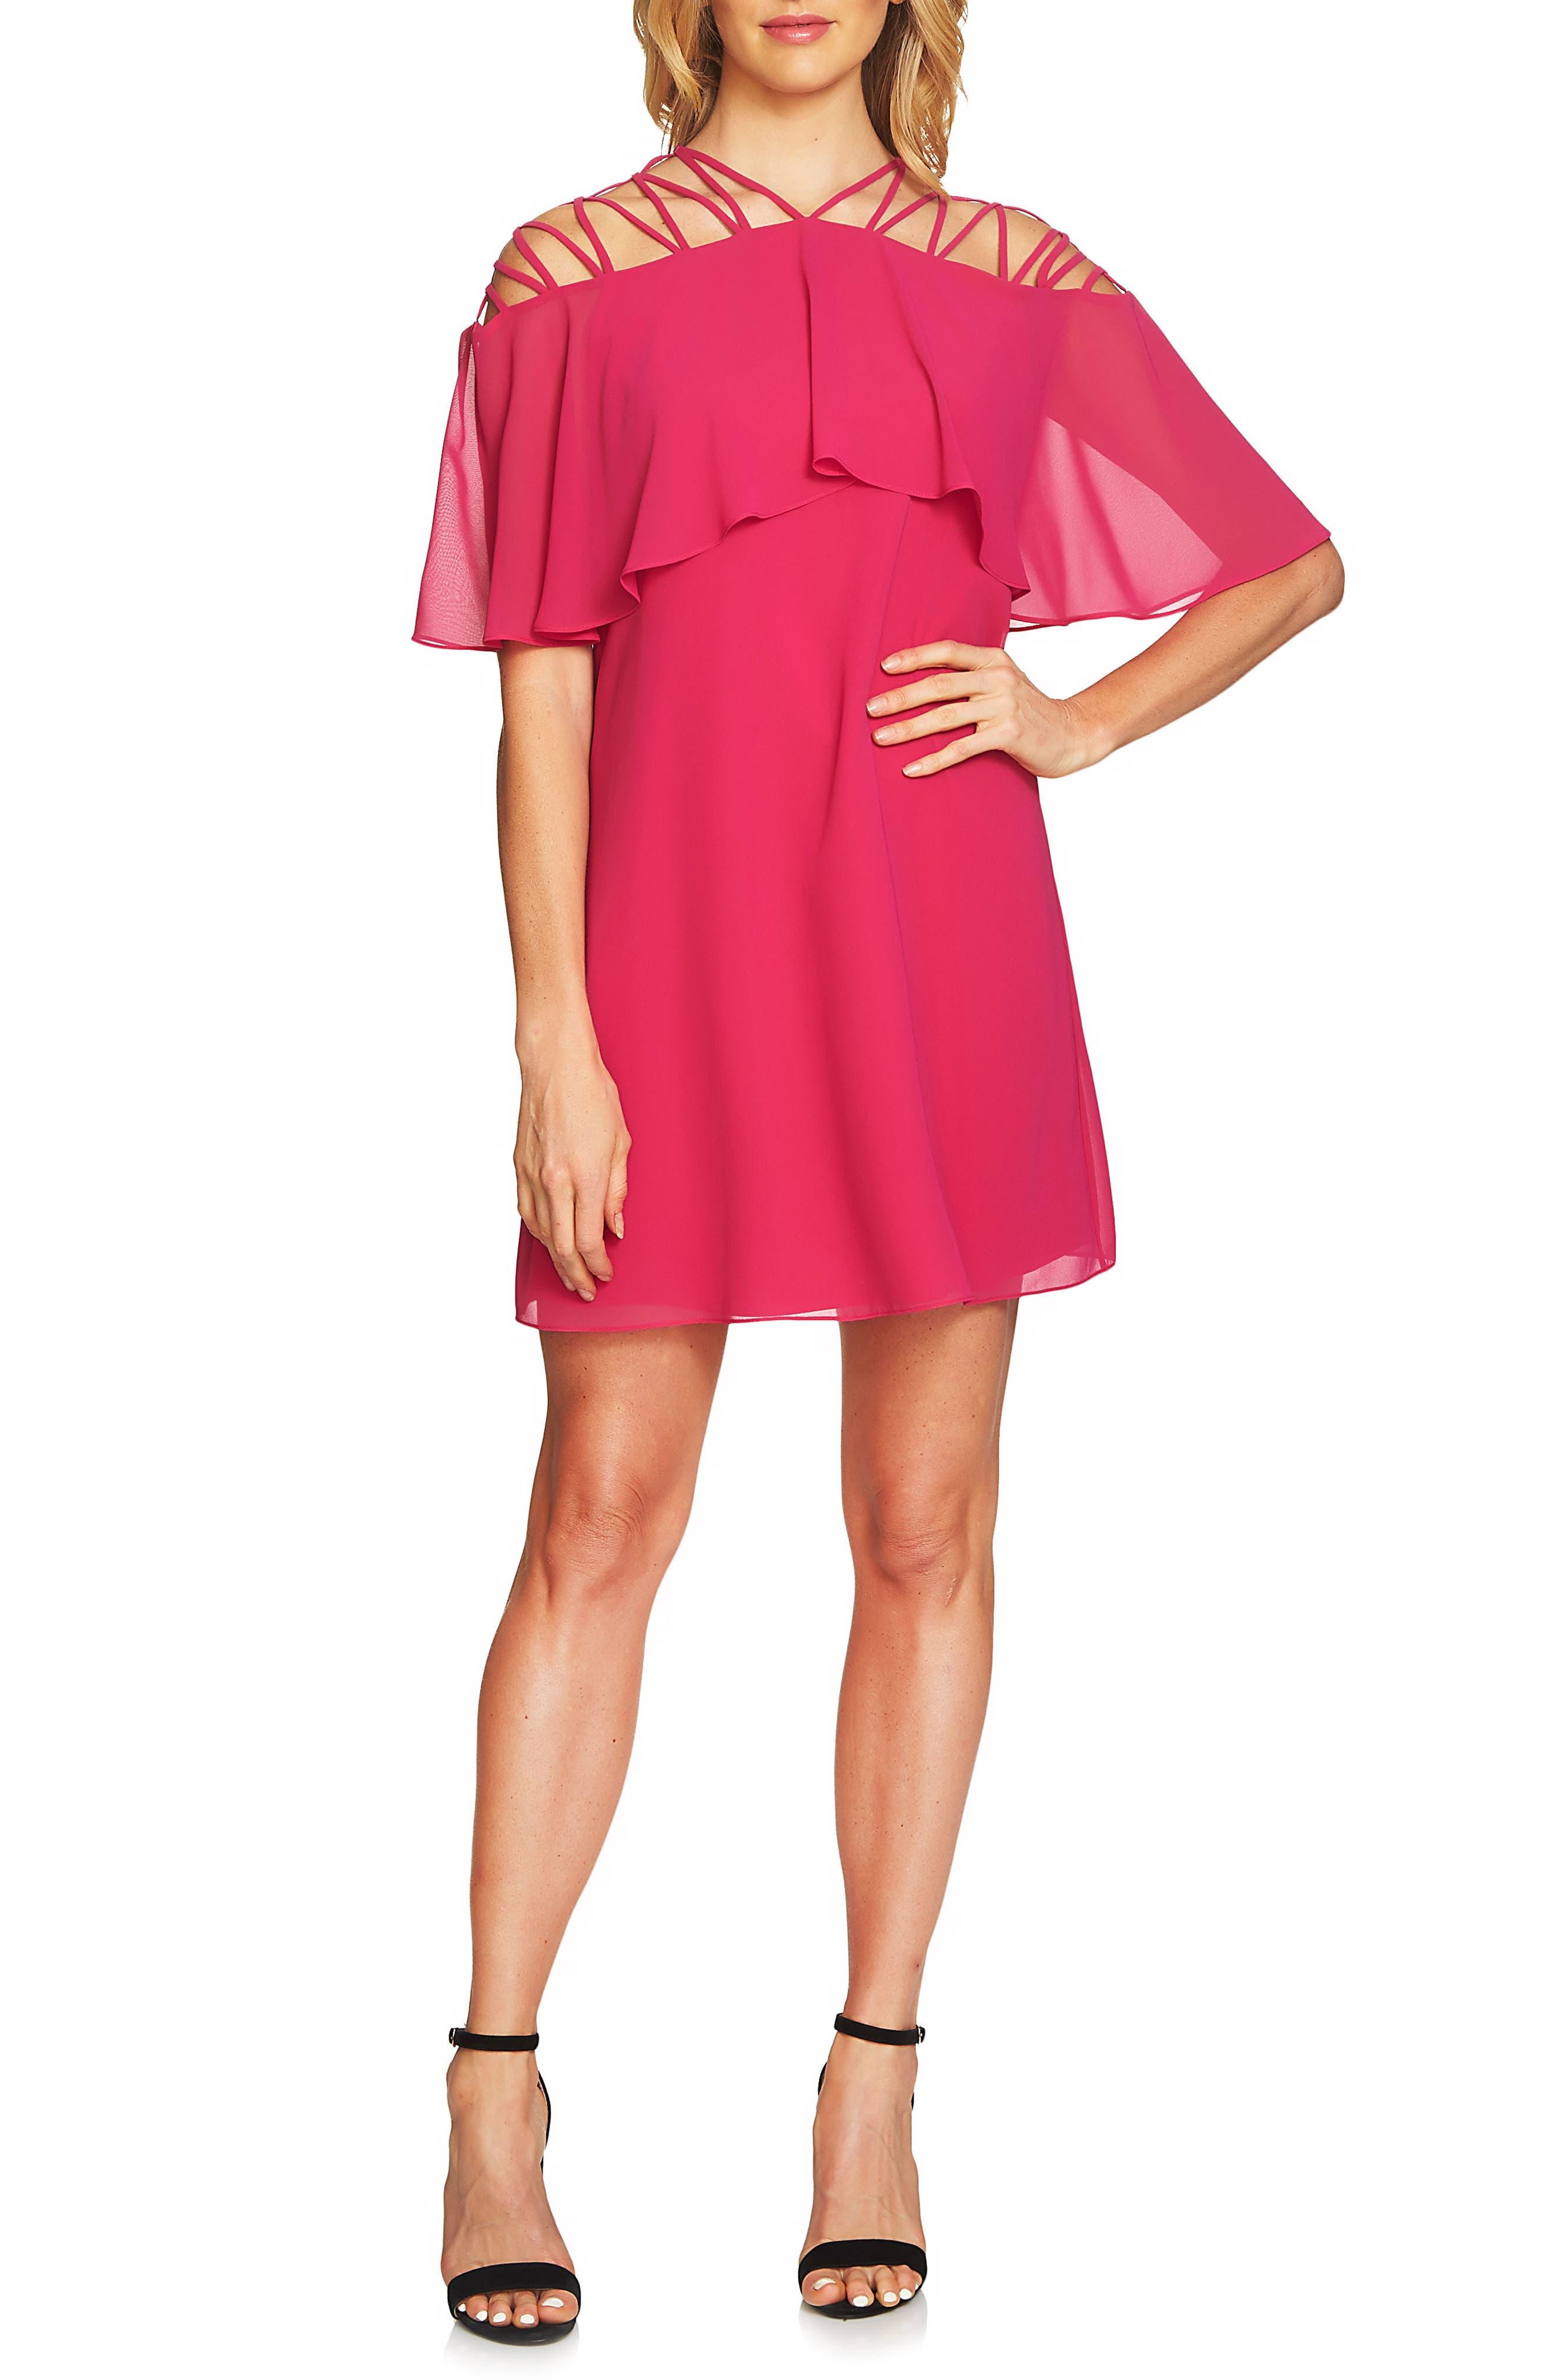 Taylor Lattice Chiffon Shift Dress,                         Main,                         color, Rose Dahlia